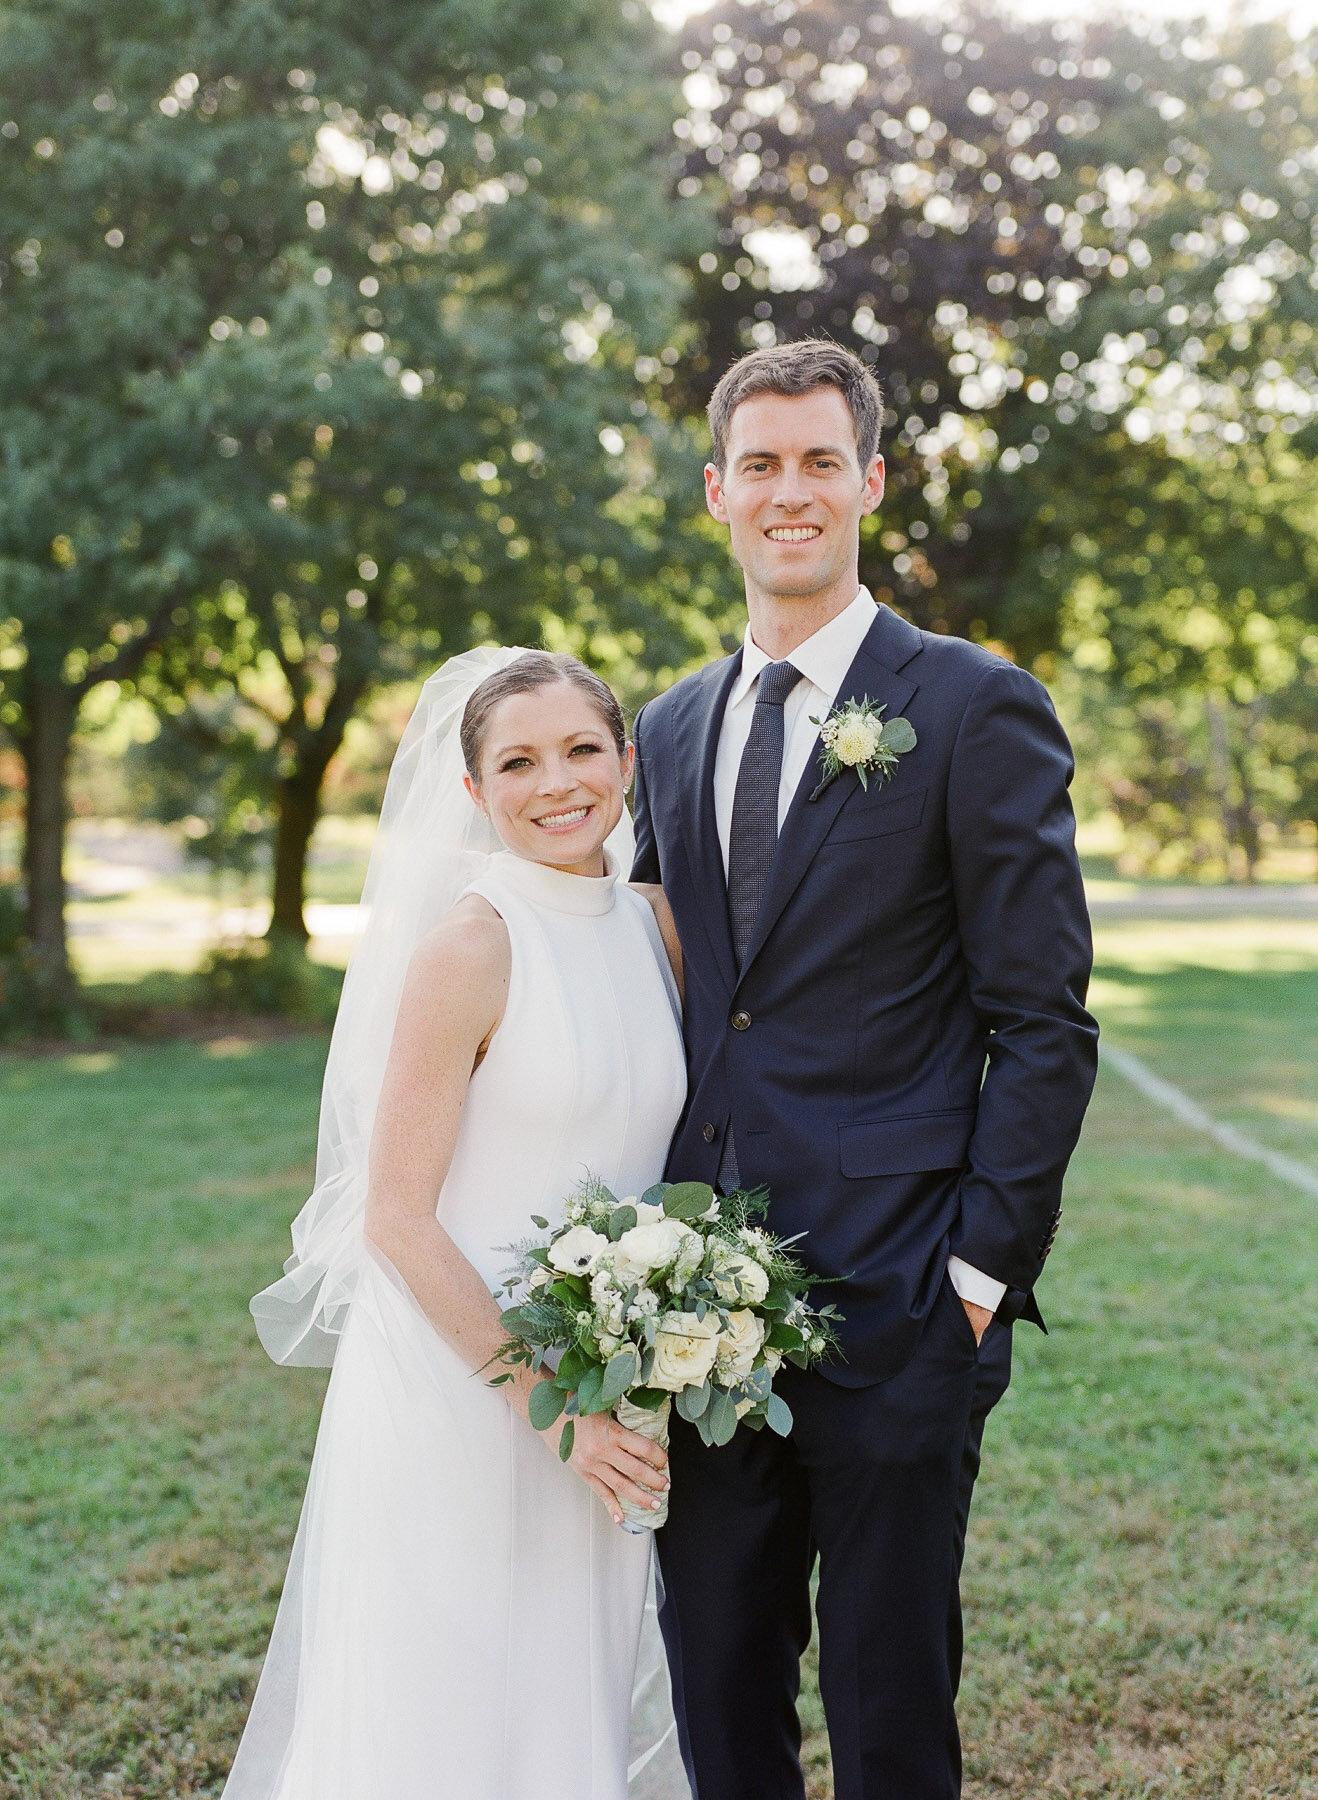 Adelphi Saratoga Wedding by Michelle Lange Photography-27.jpg